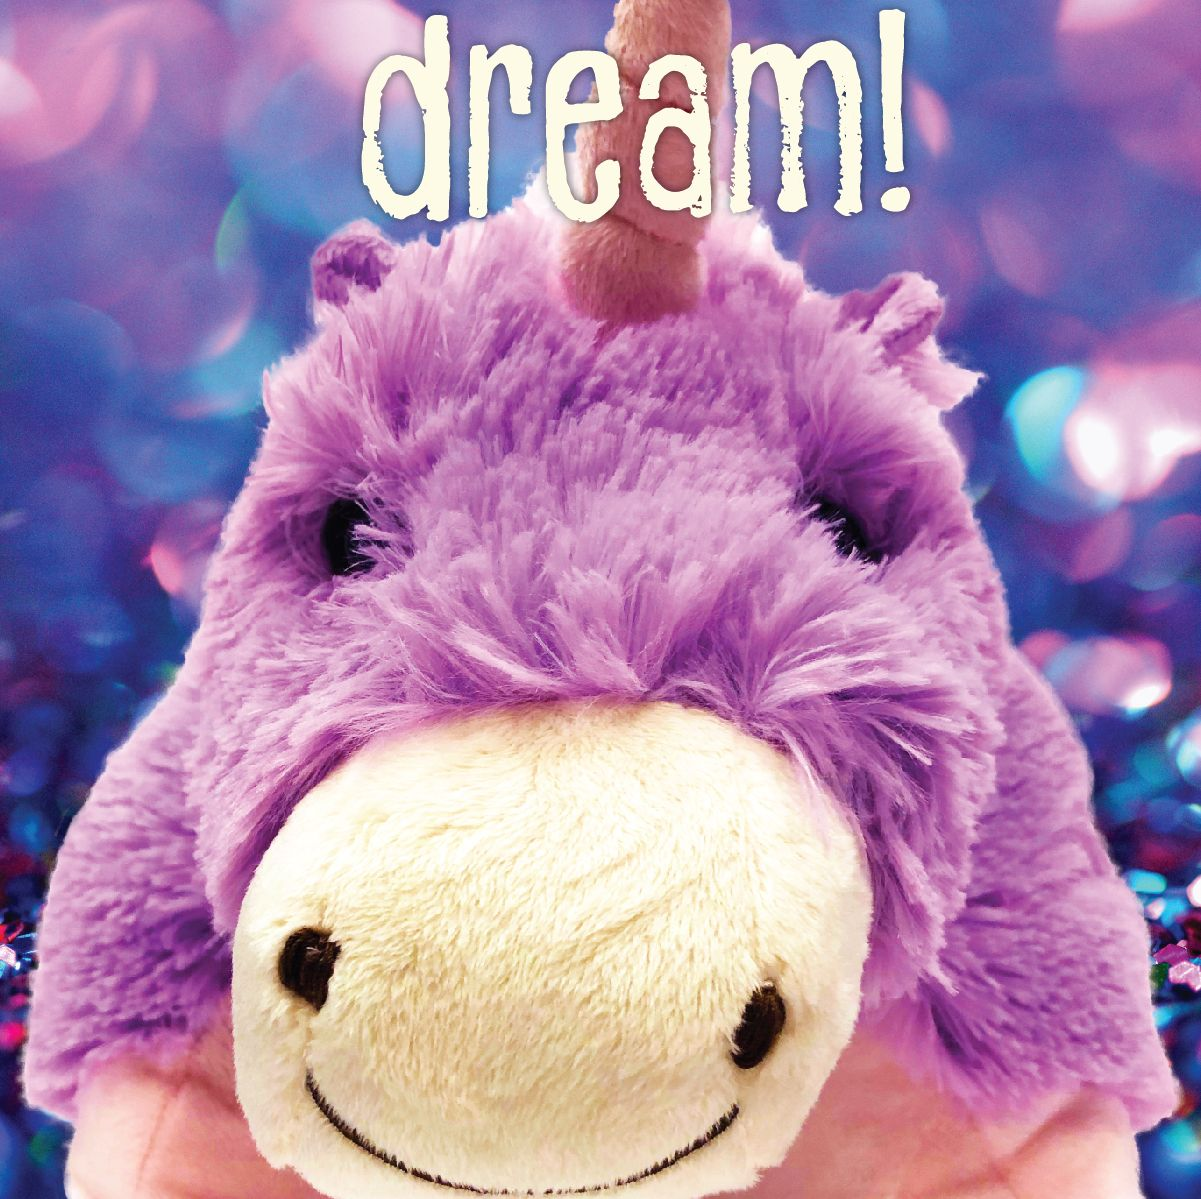 Magical Unicorn Pillow Pet In 2020 Unicorn Pillow Pet Unicorn Pillow Animal Pillows